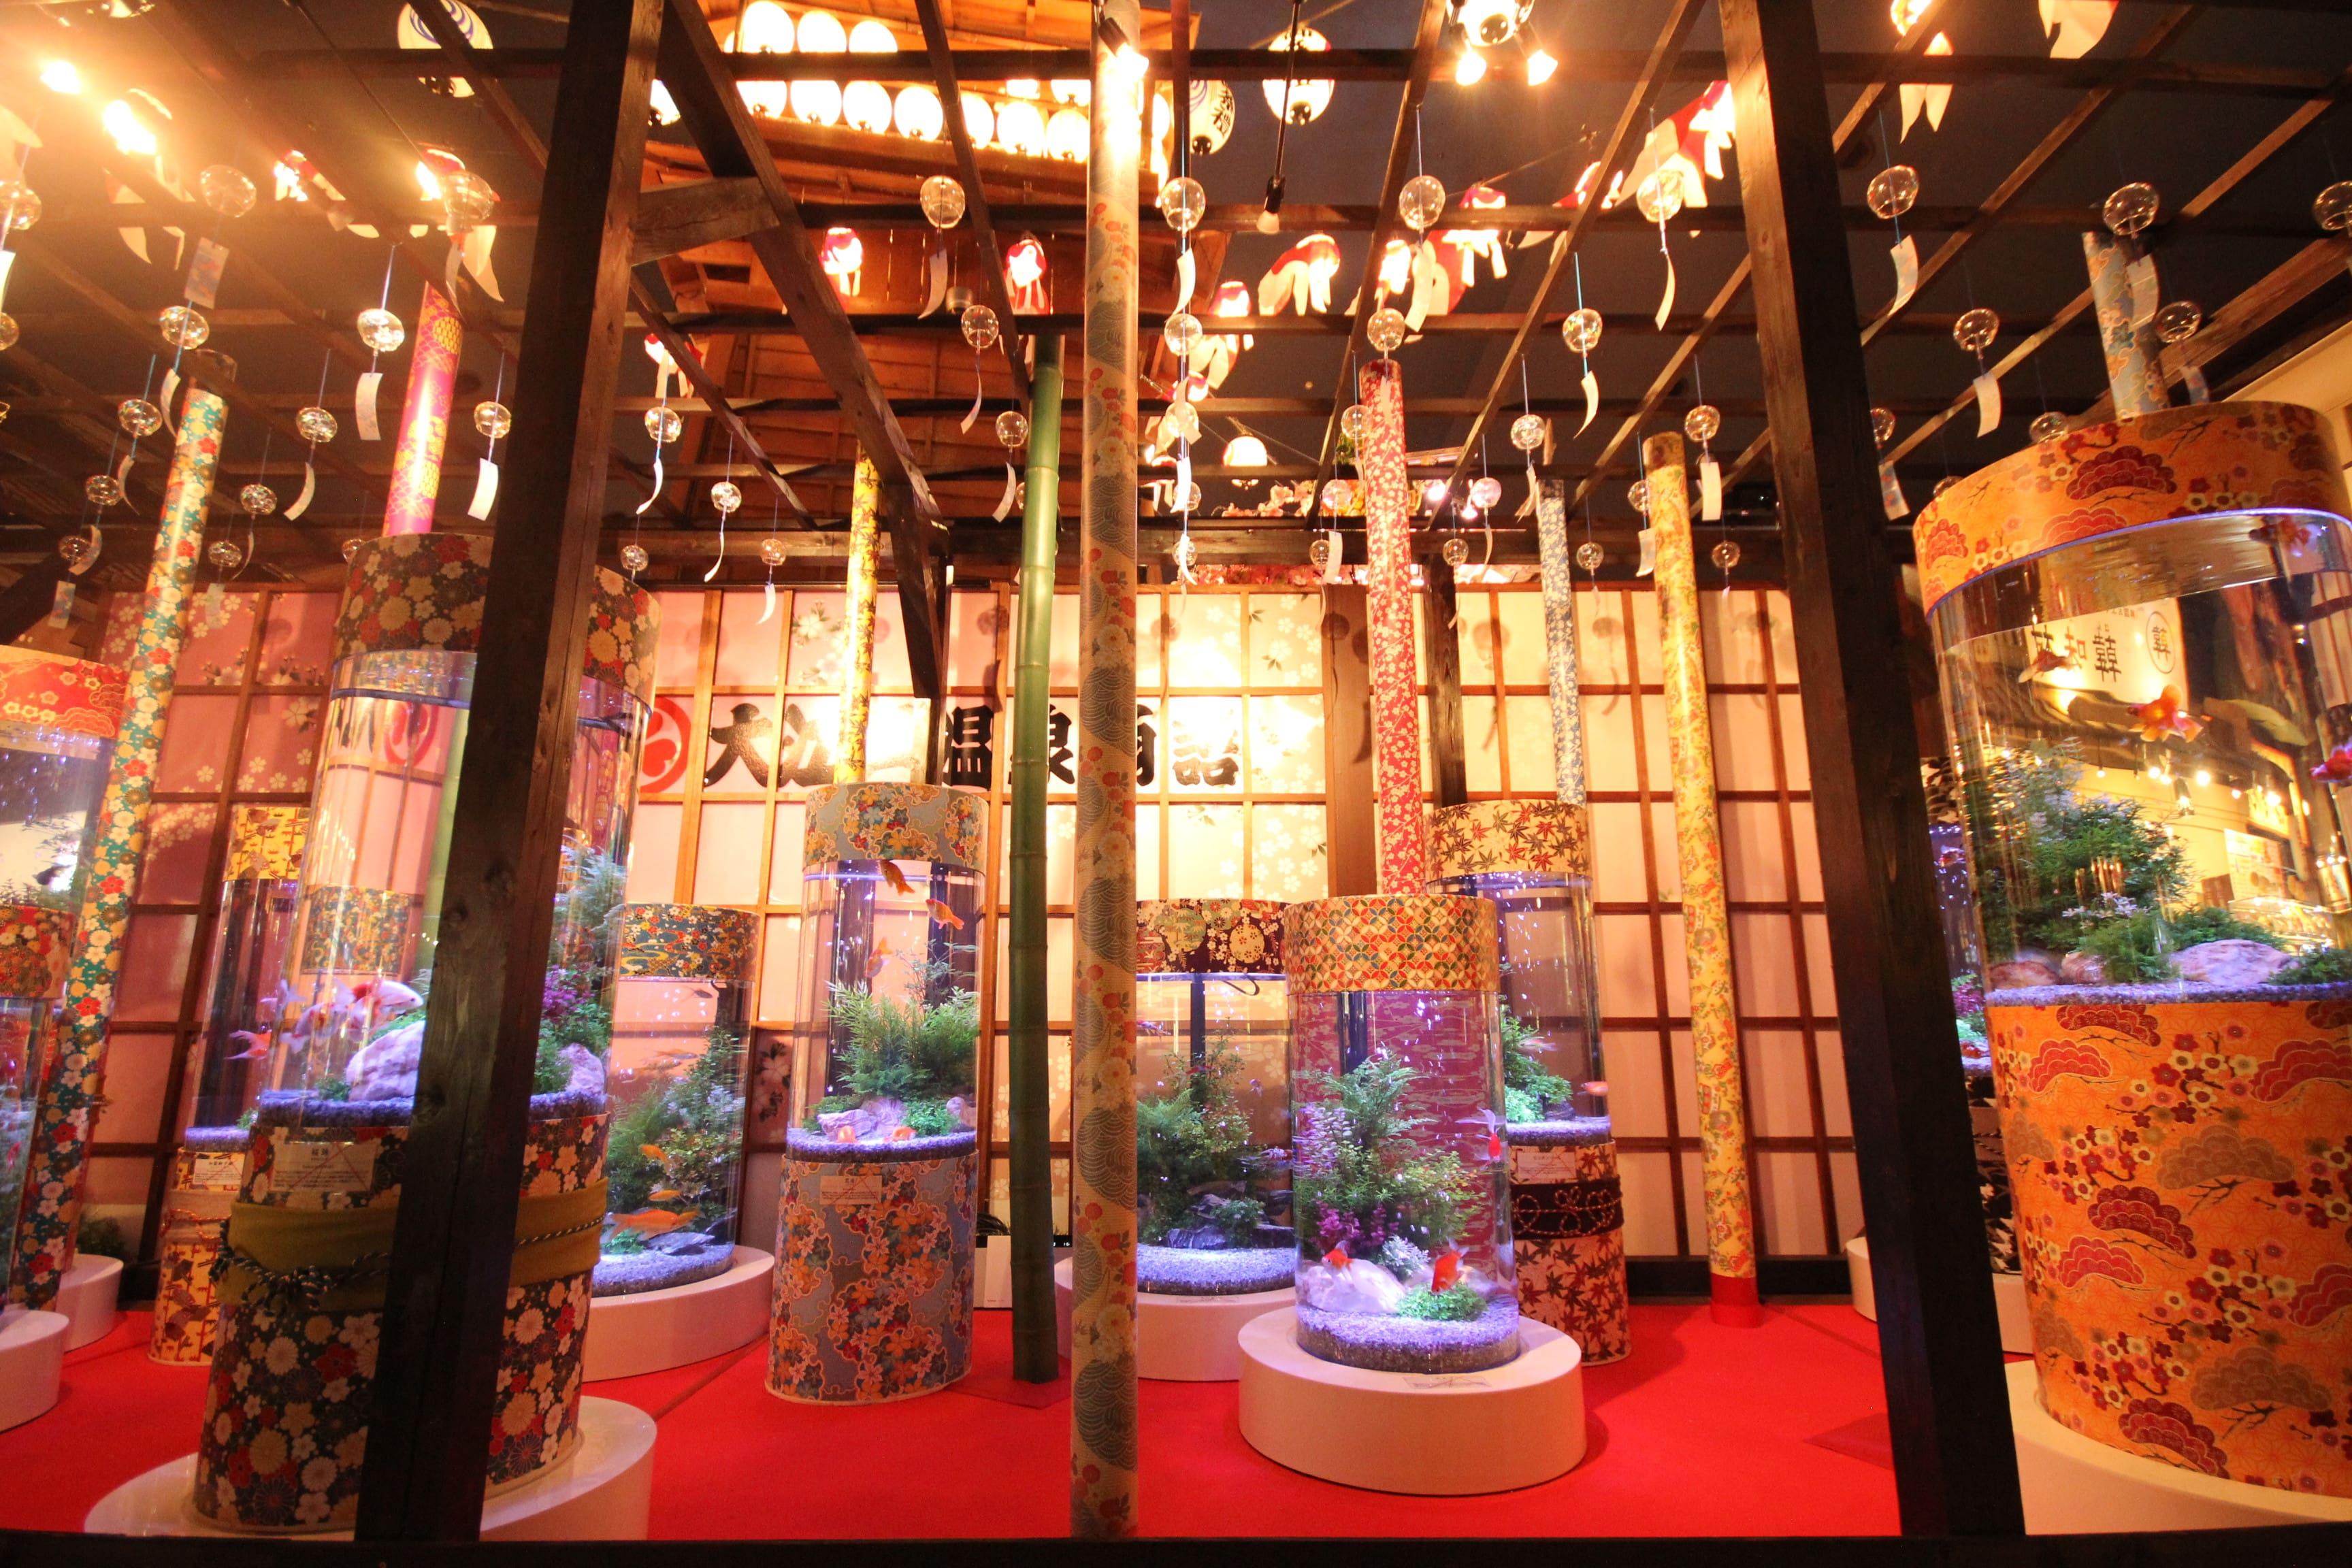 sub1大江戸温泉金魚物語 金魚祭りアート博覧会 oedo onsen monogatari kingyo matsuri art hakurankai-min